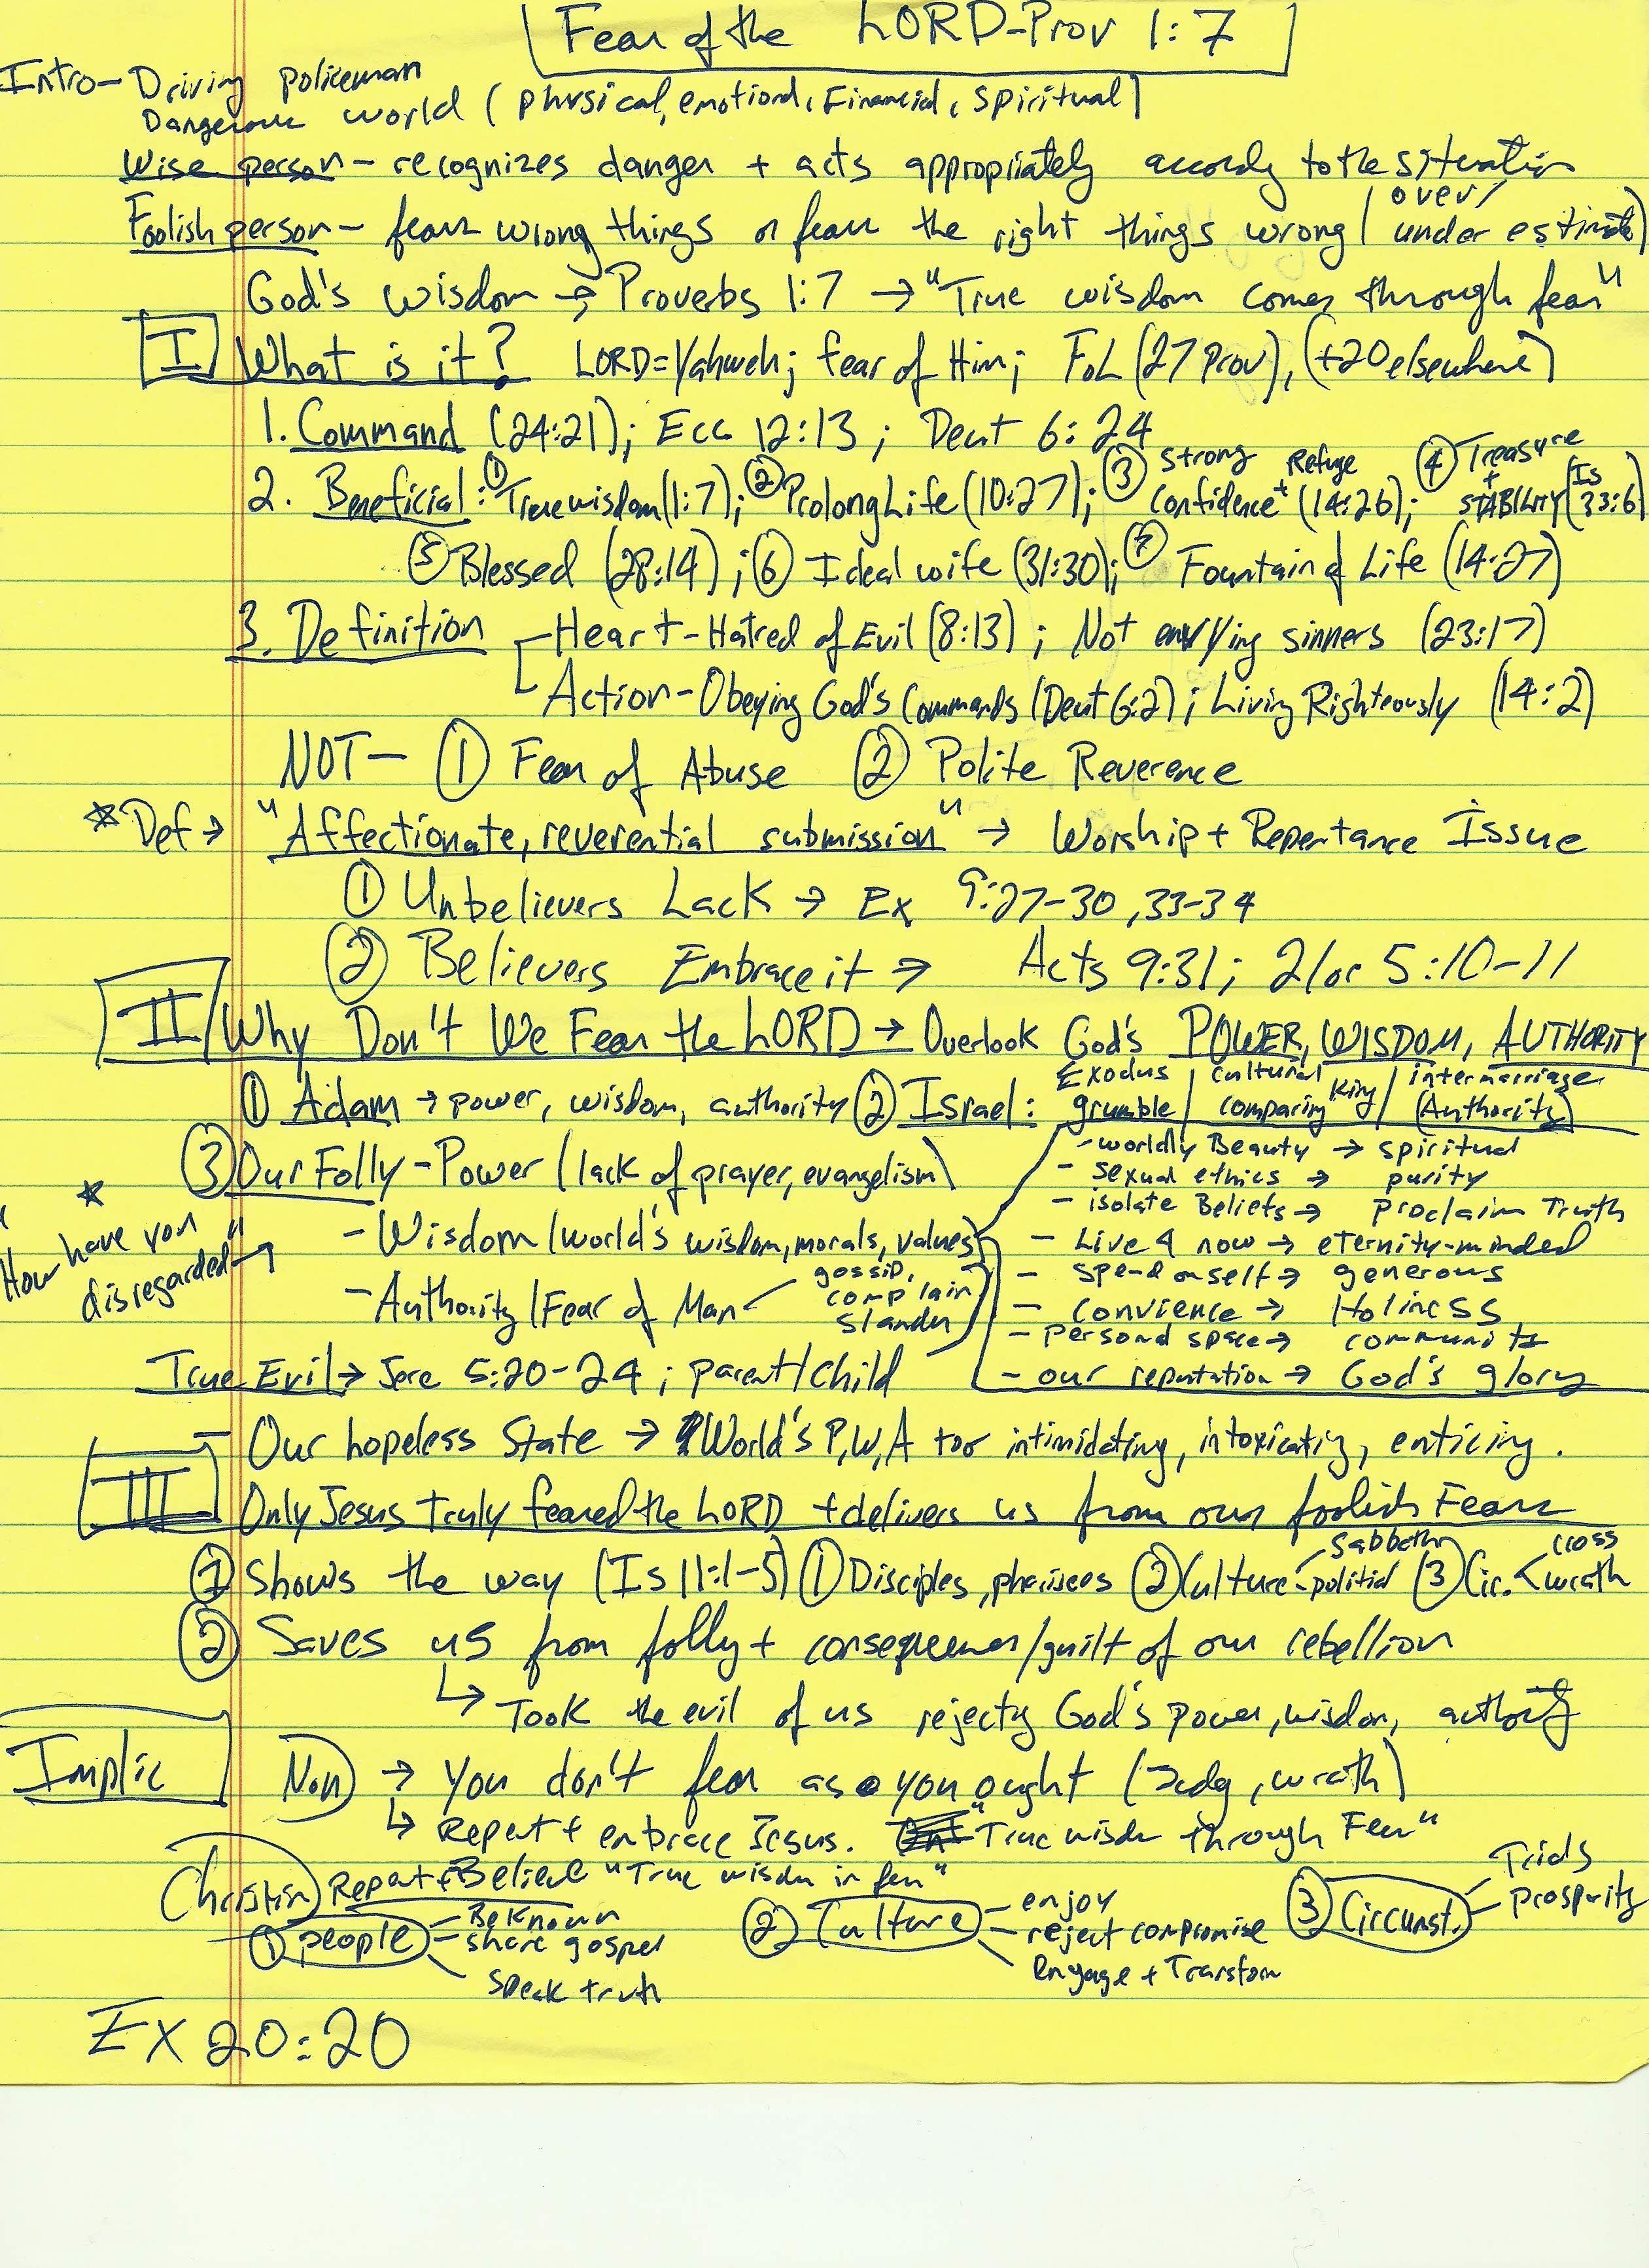 Fear of the LORD jpeg Sermon manuscript